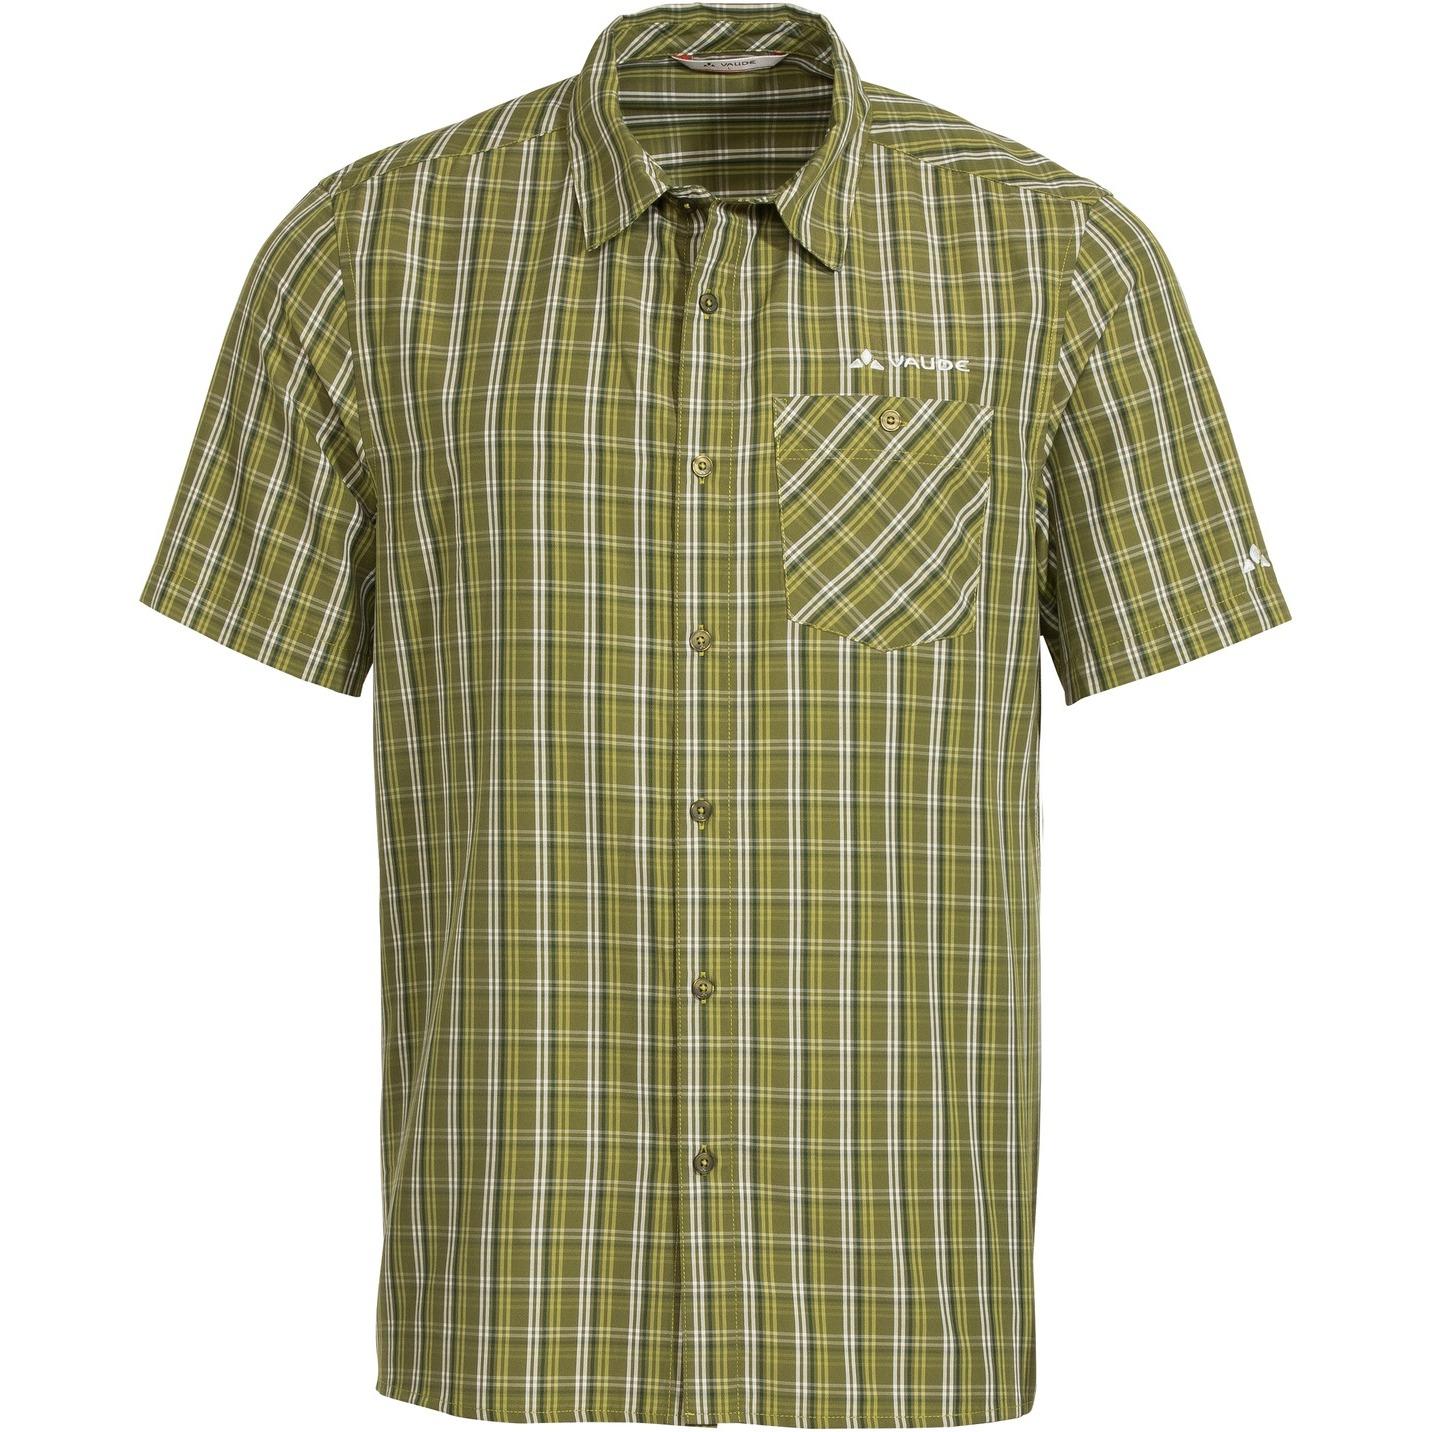 Vaude Men's Albsteig Shirt II - wild lime